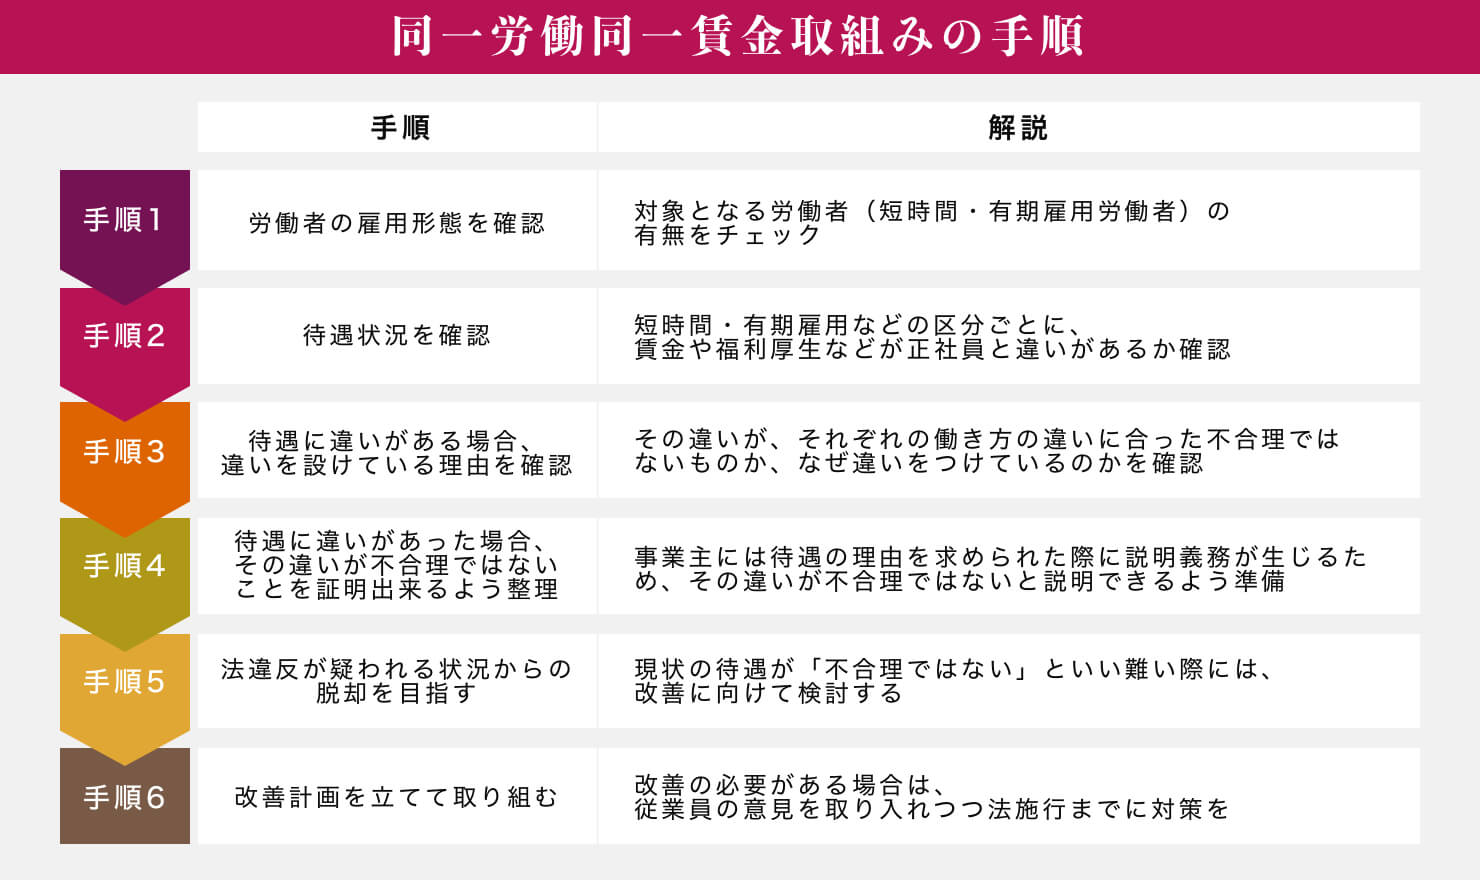 同一労働同一賃金取組みの手順 (1).jpg